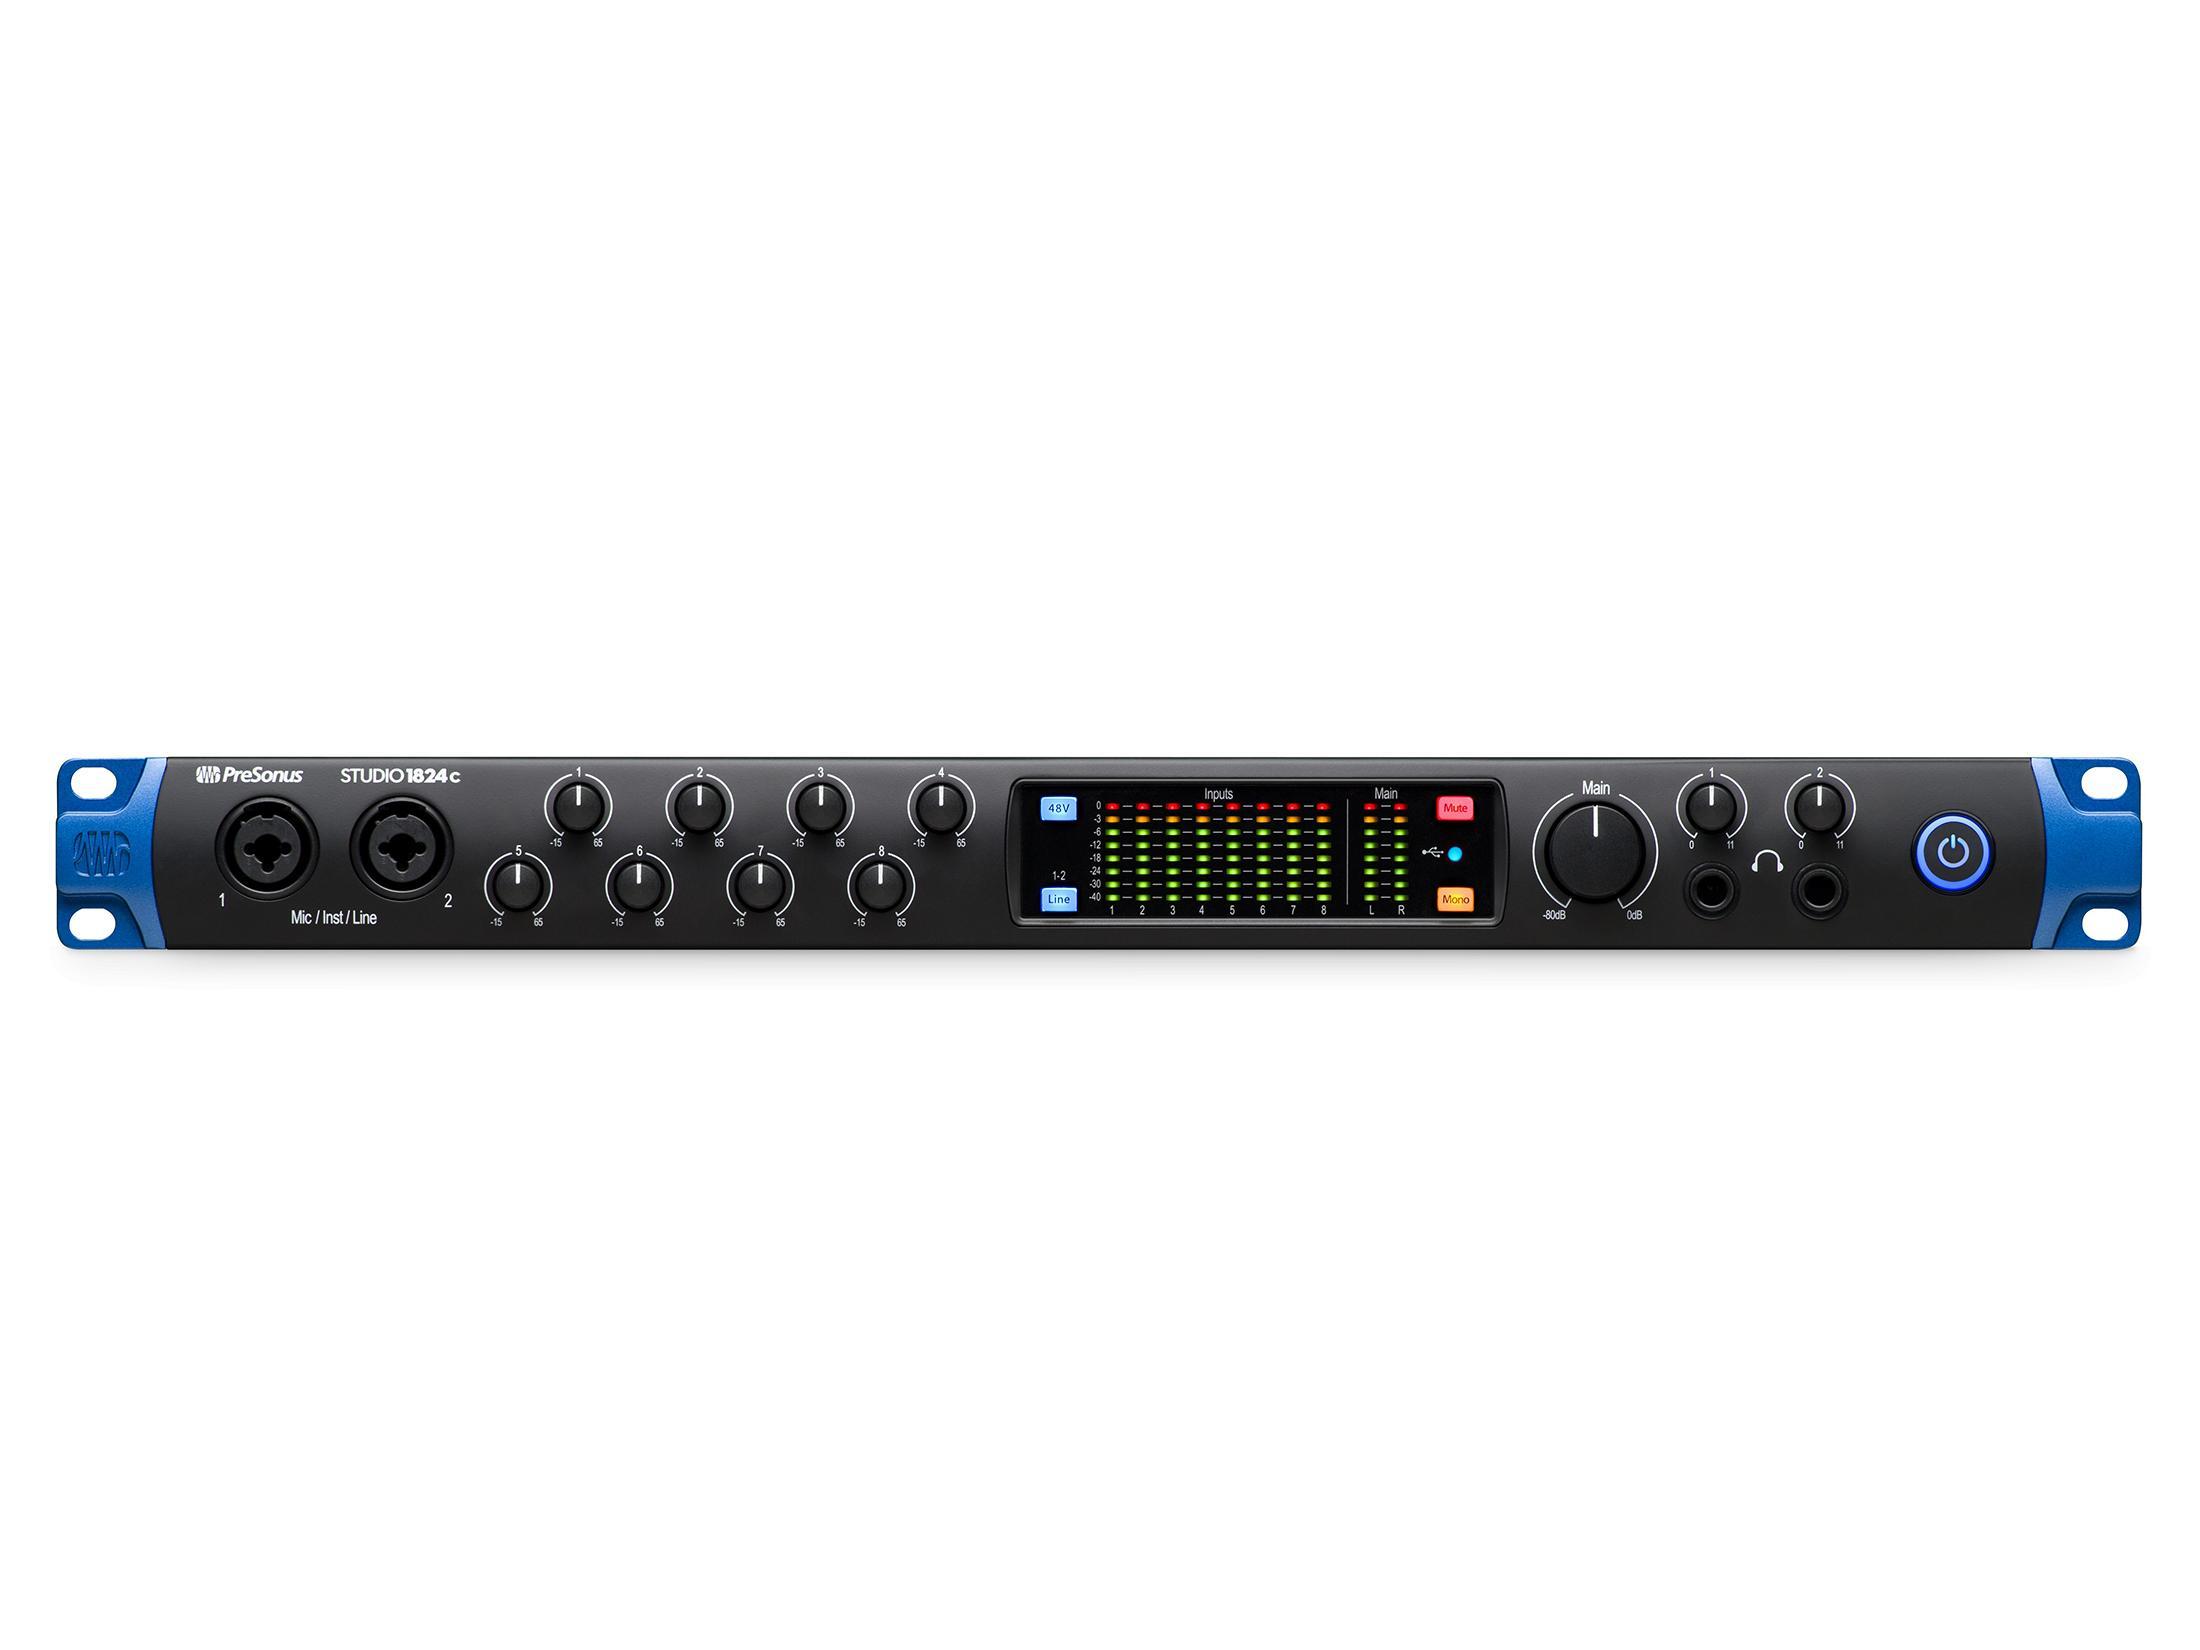 PreSonus Studio 1824c The full-featured ultra-high-def 18x24 USB-C audio interface with 8 Mic inputs/24-bit/192kHz/ADAT I/O